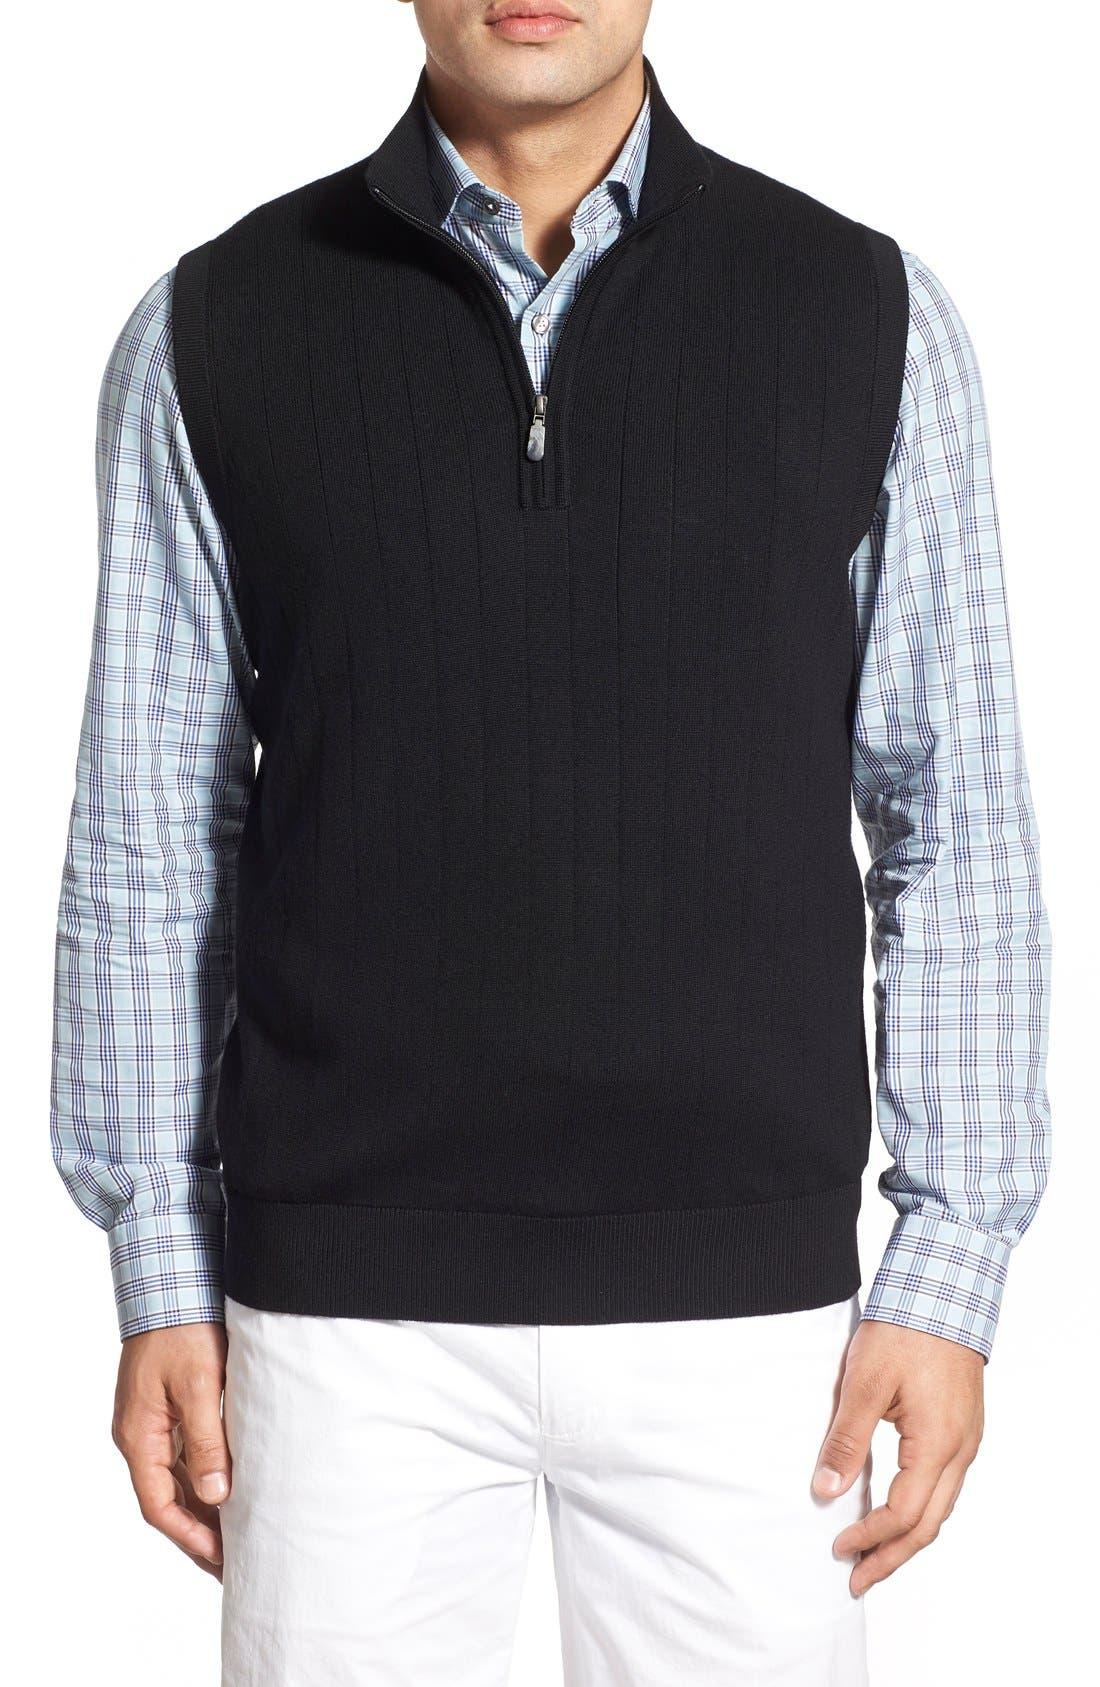 Main Image - Bobby Jones Quarter Zip Wool Sweater Vest